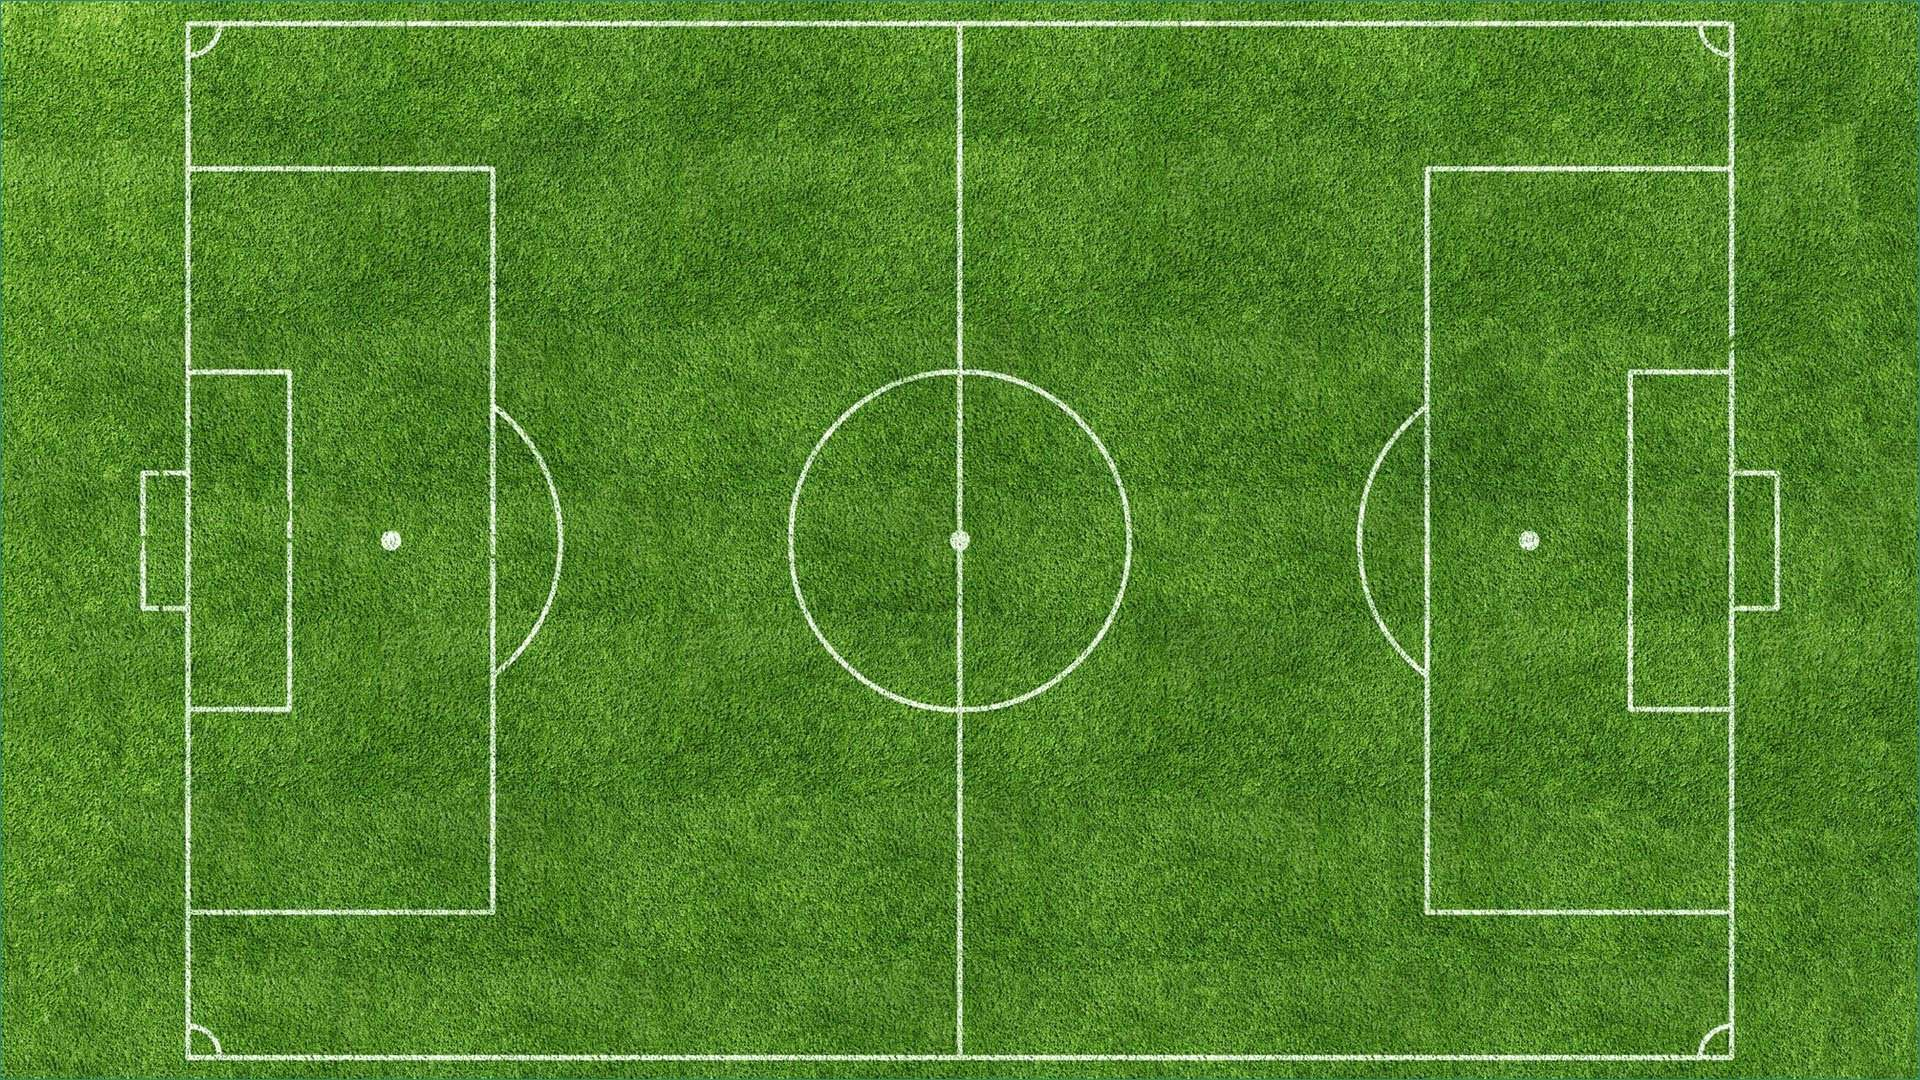 طول ملعب كرة القدم وعرضه Tacteec